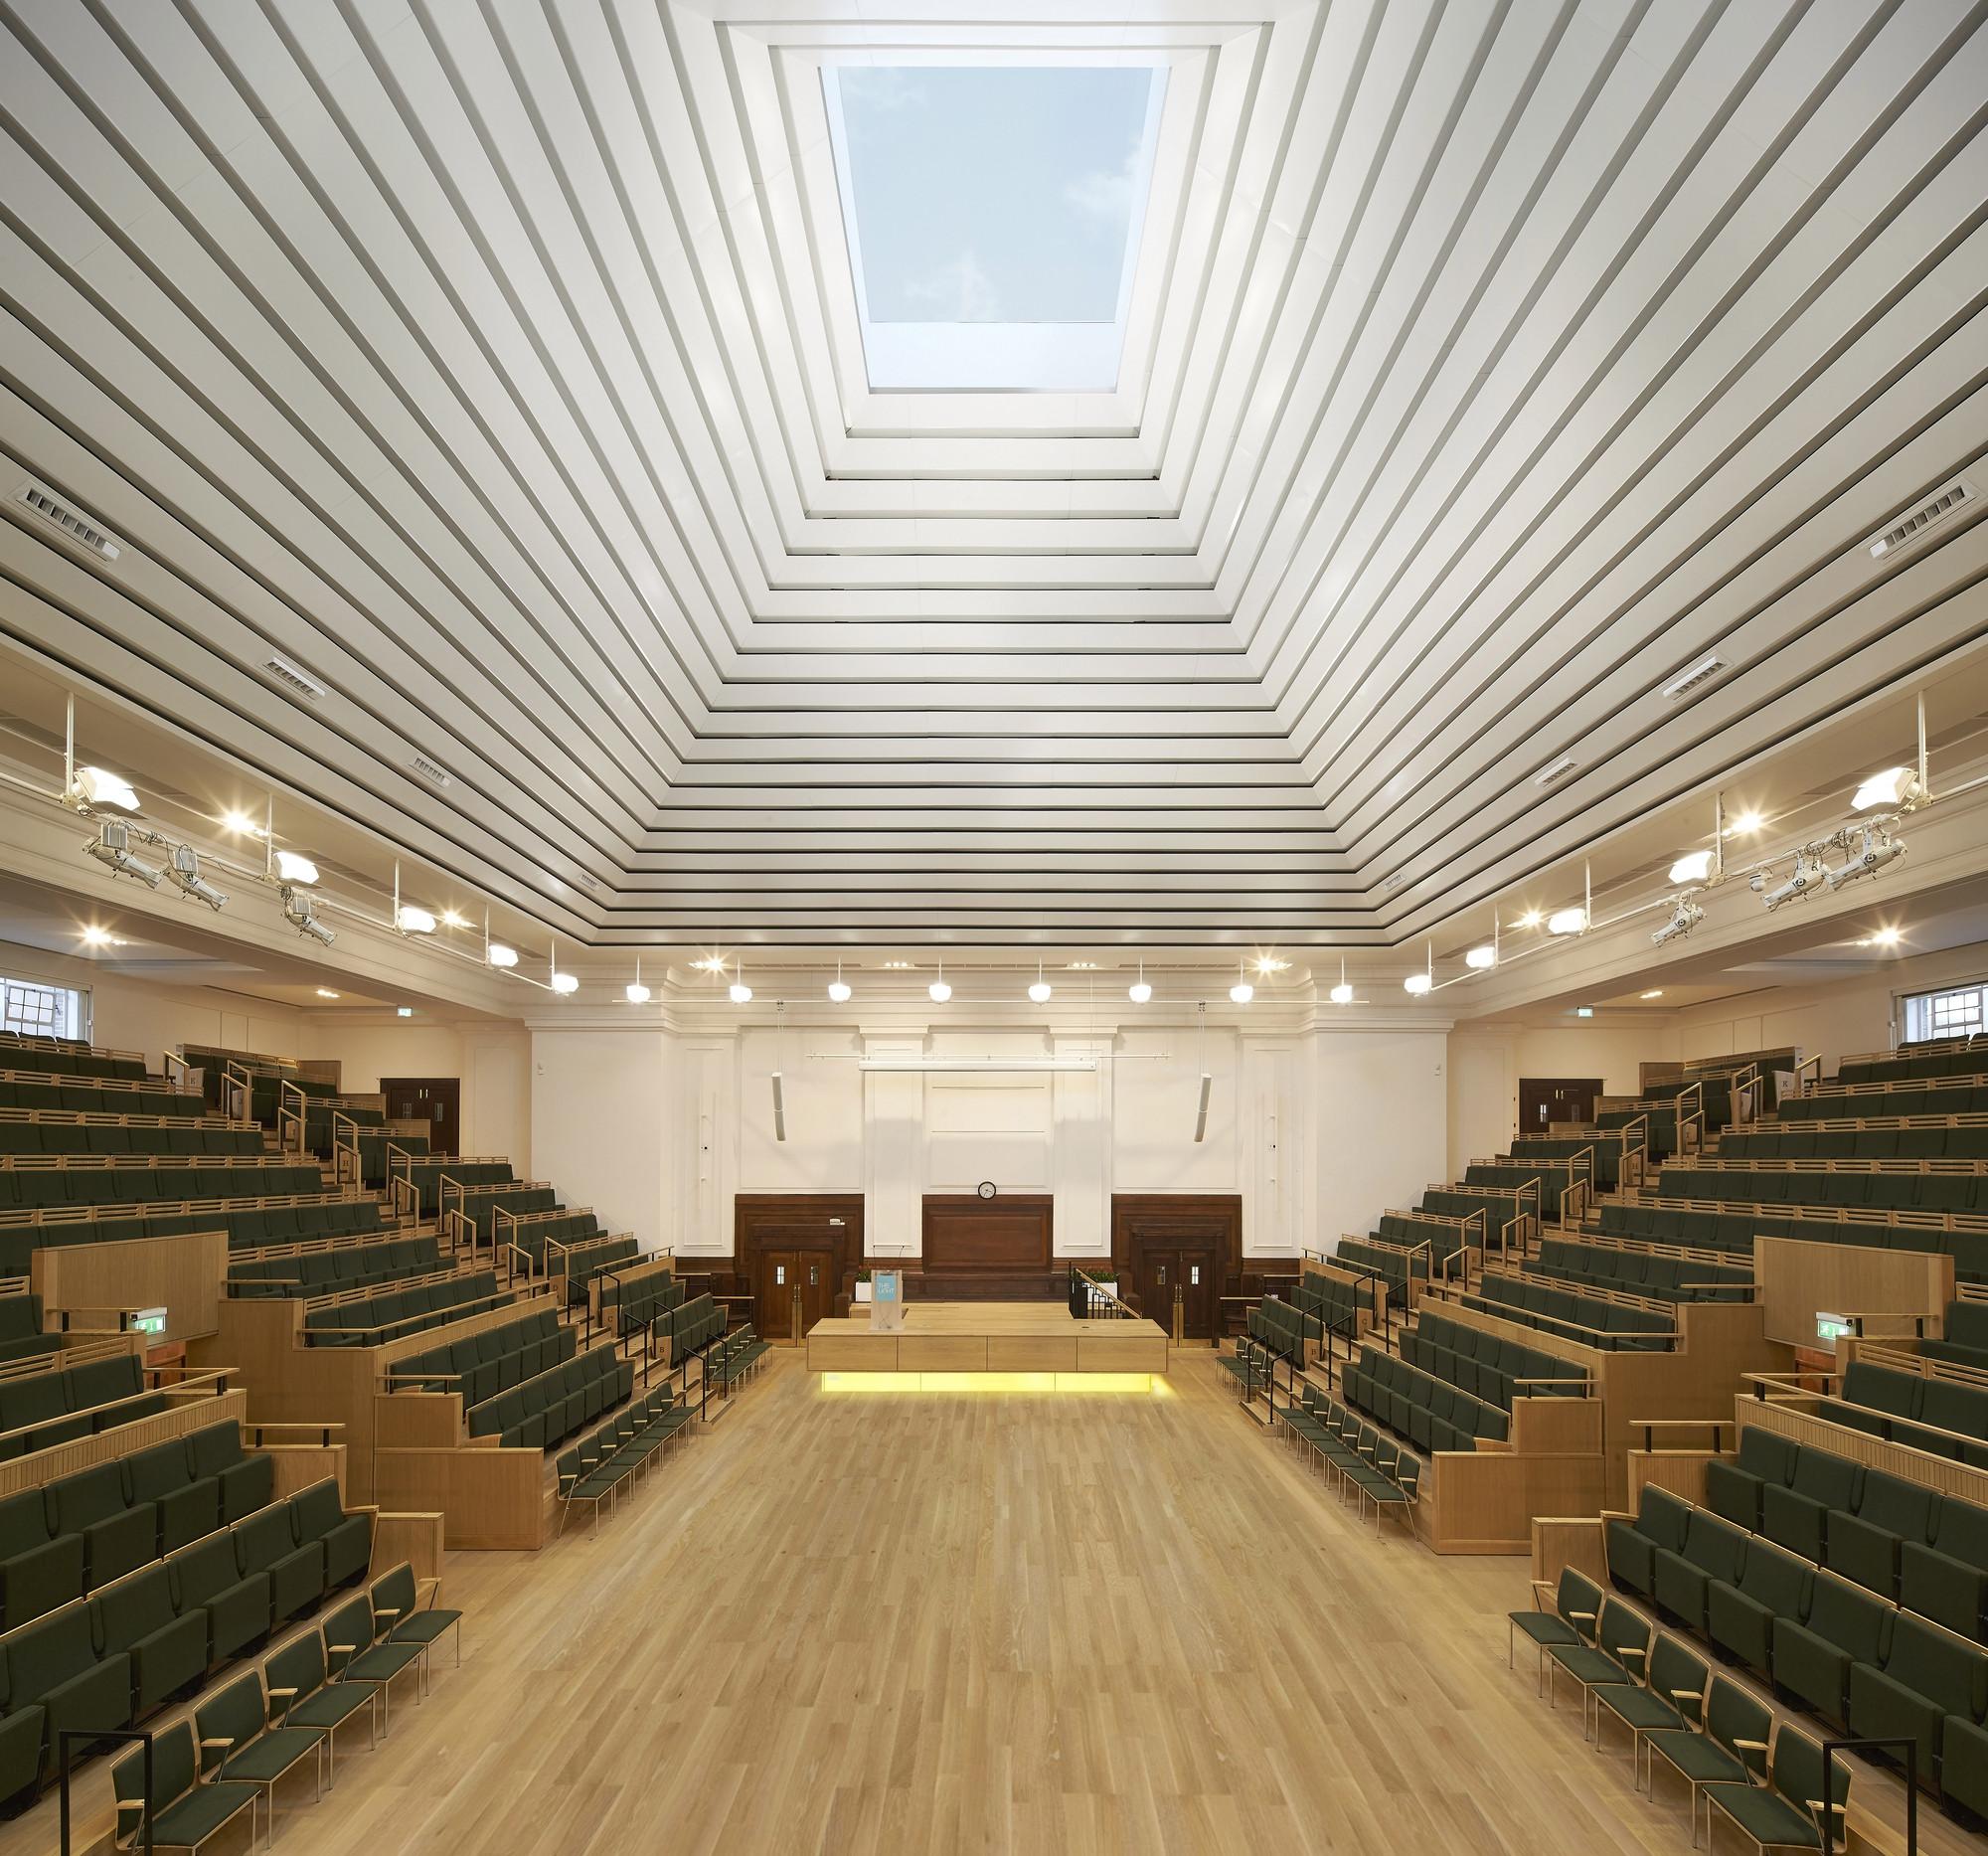 New Light Theater Project: Friends House / John McAslan + Partners